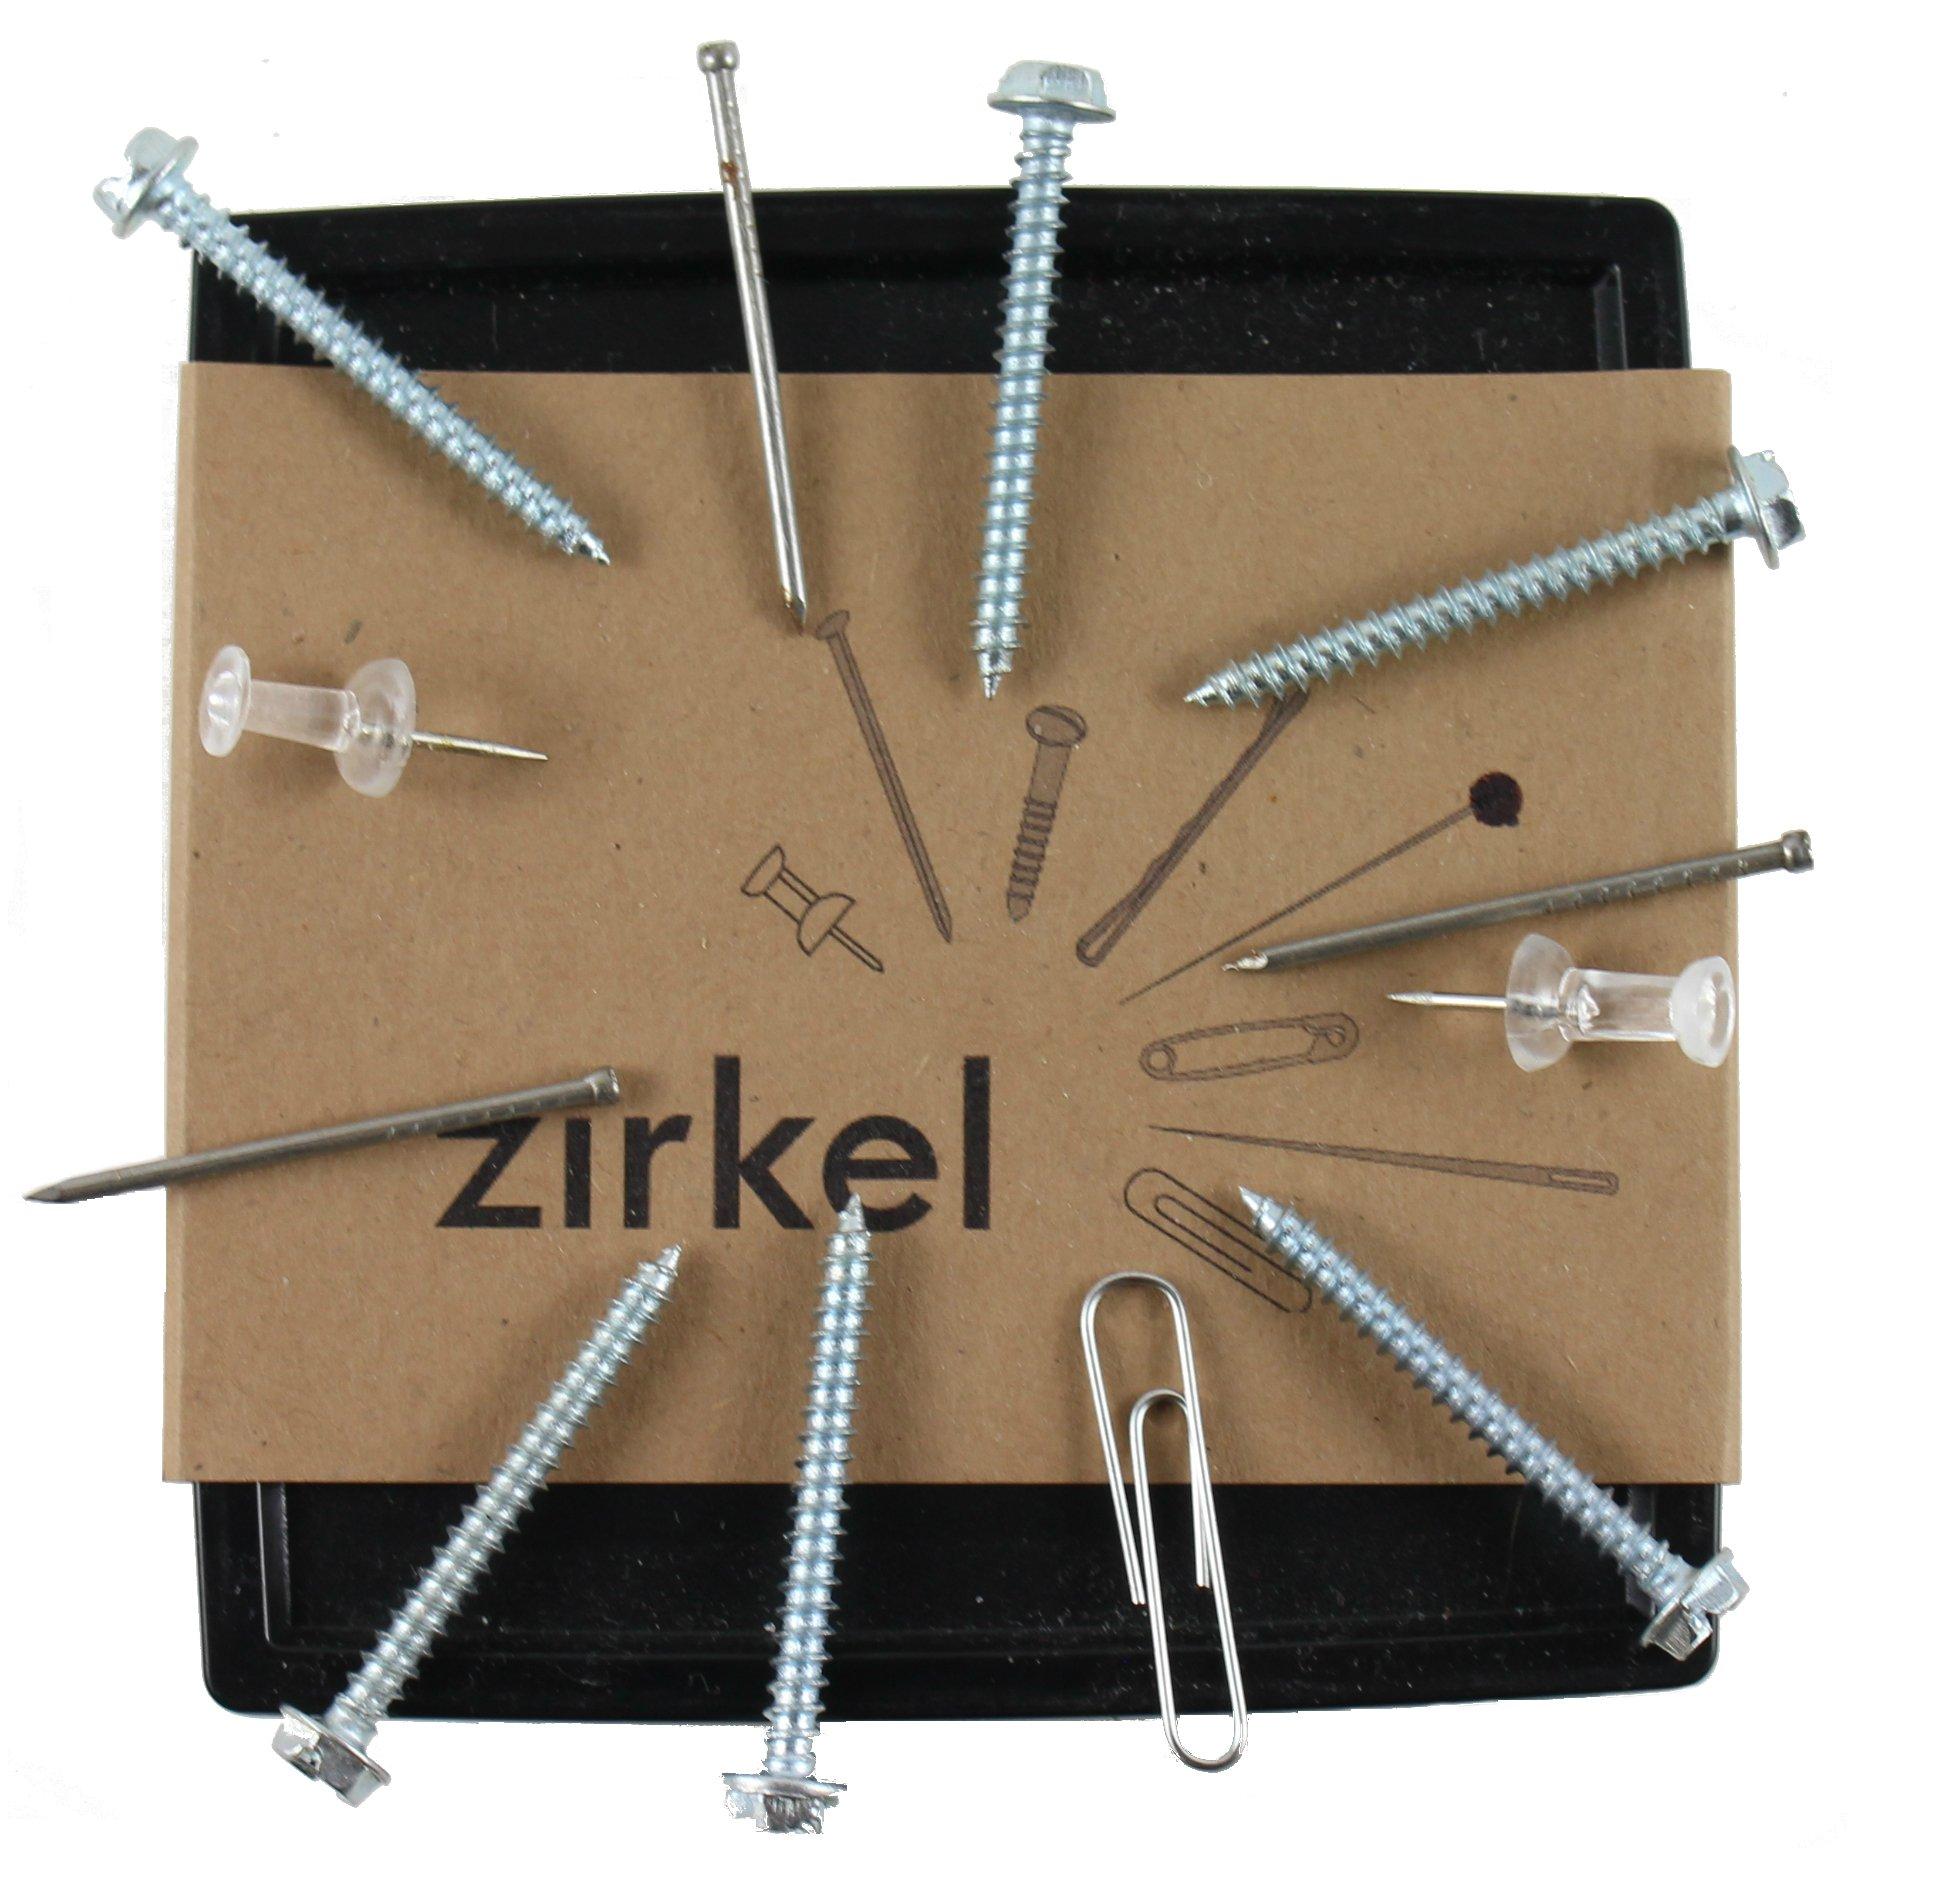 Zirkel Magnetic Organizer ZMOR Pin Cushion by The Zirkel